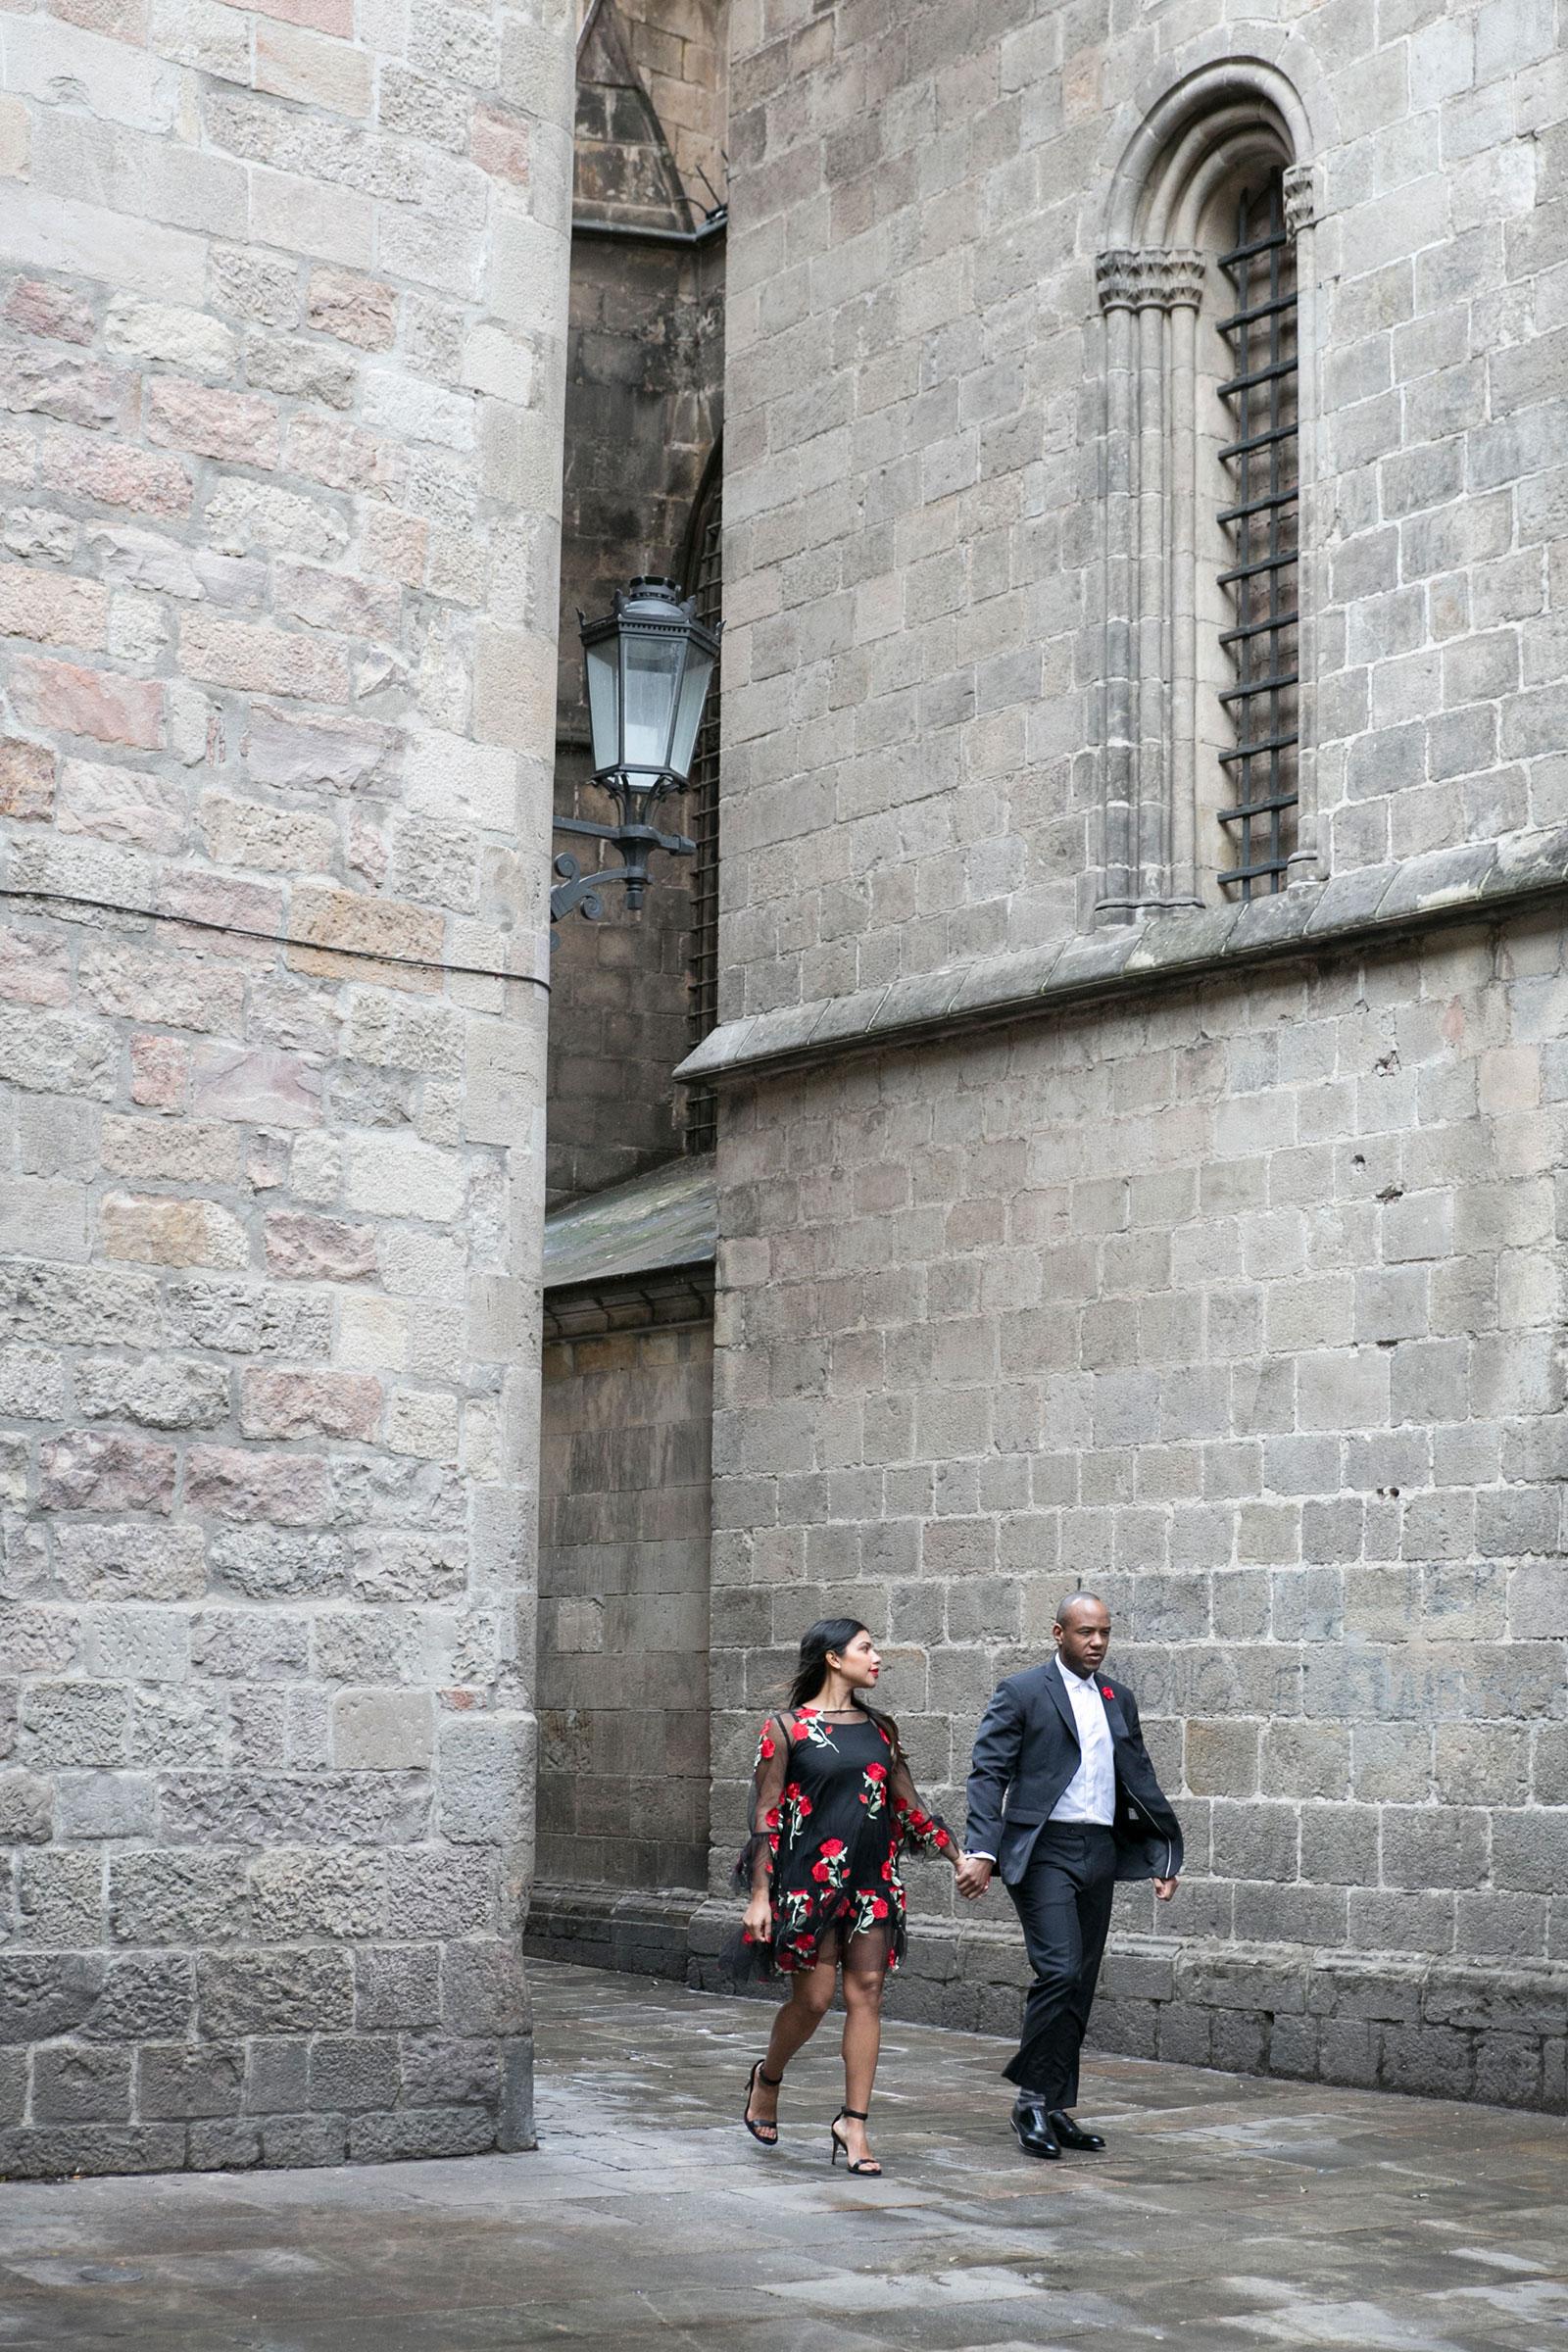 Barcelona Gothic